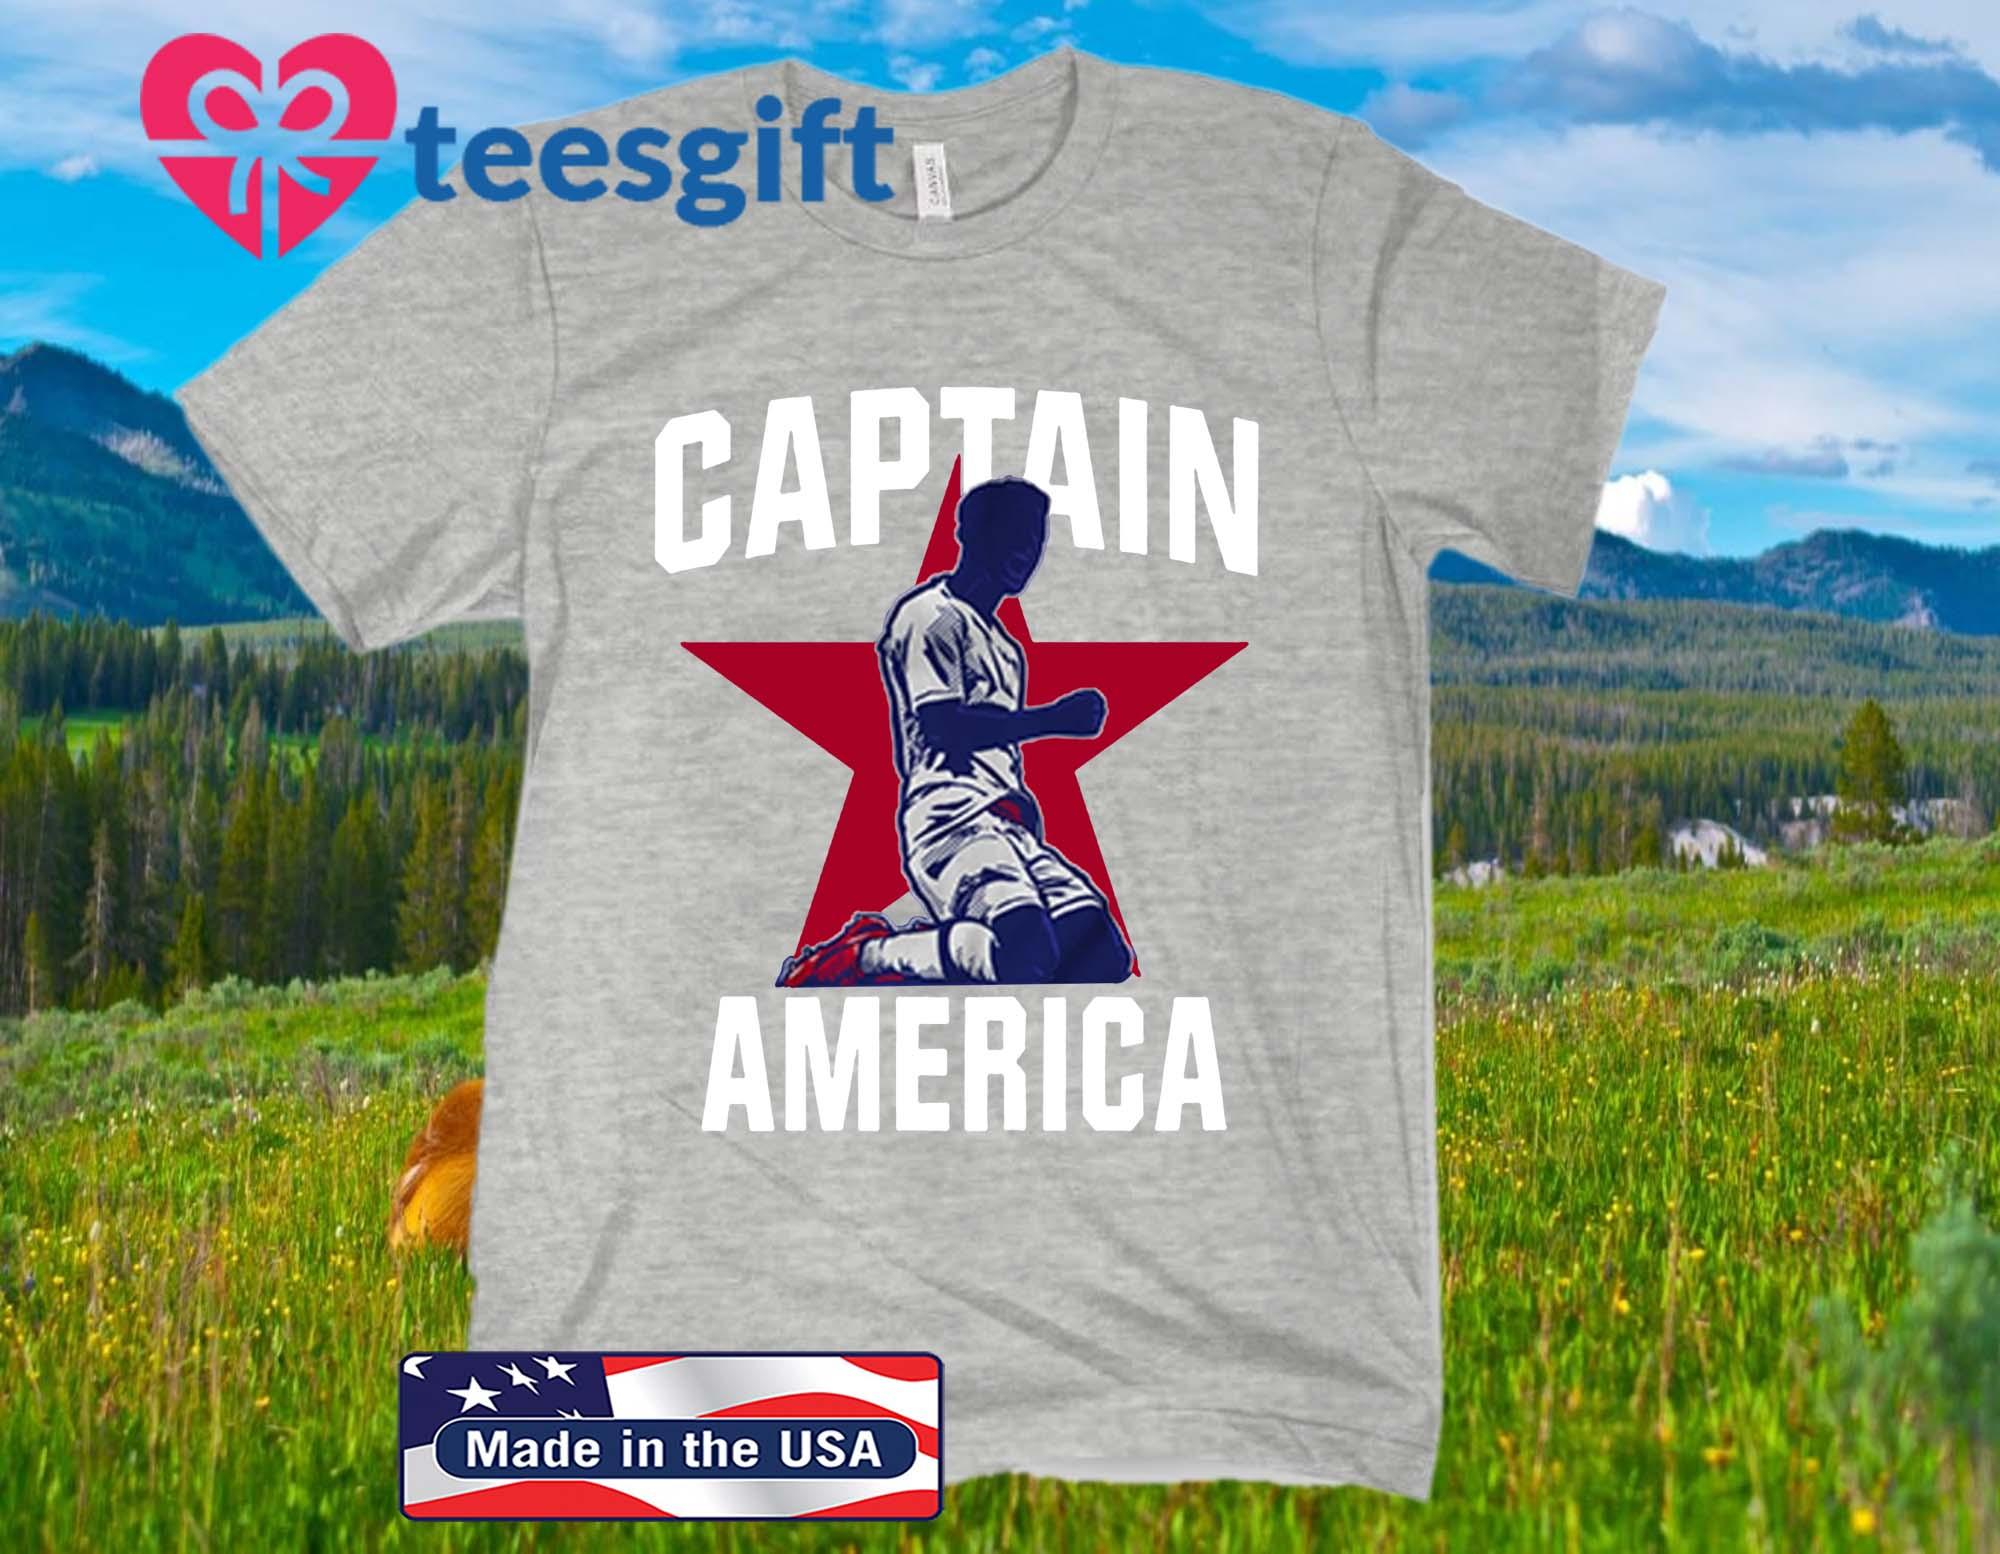 Captain America Official T-Shirt - USA Men's & English Soccer